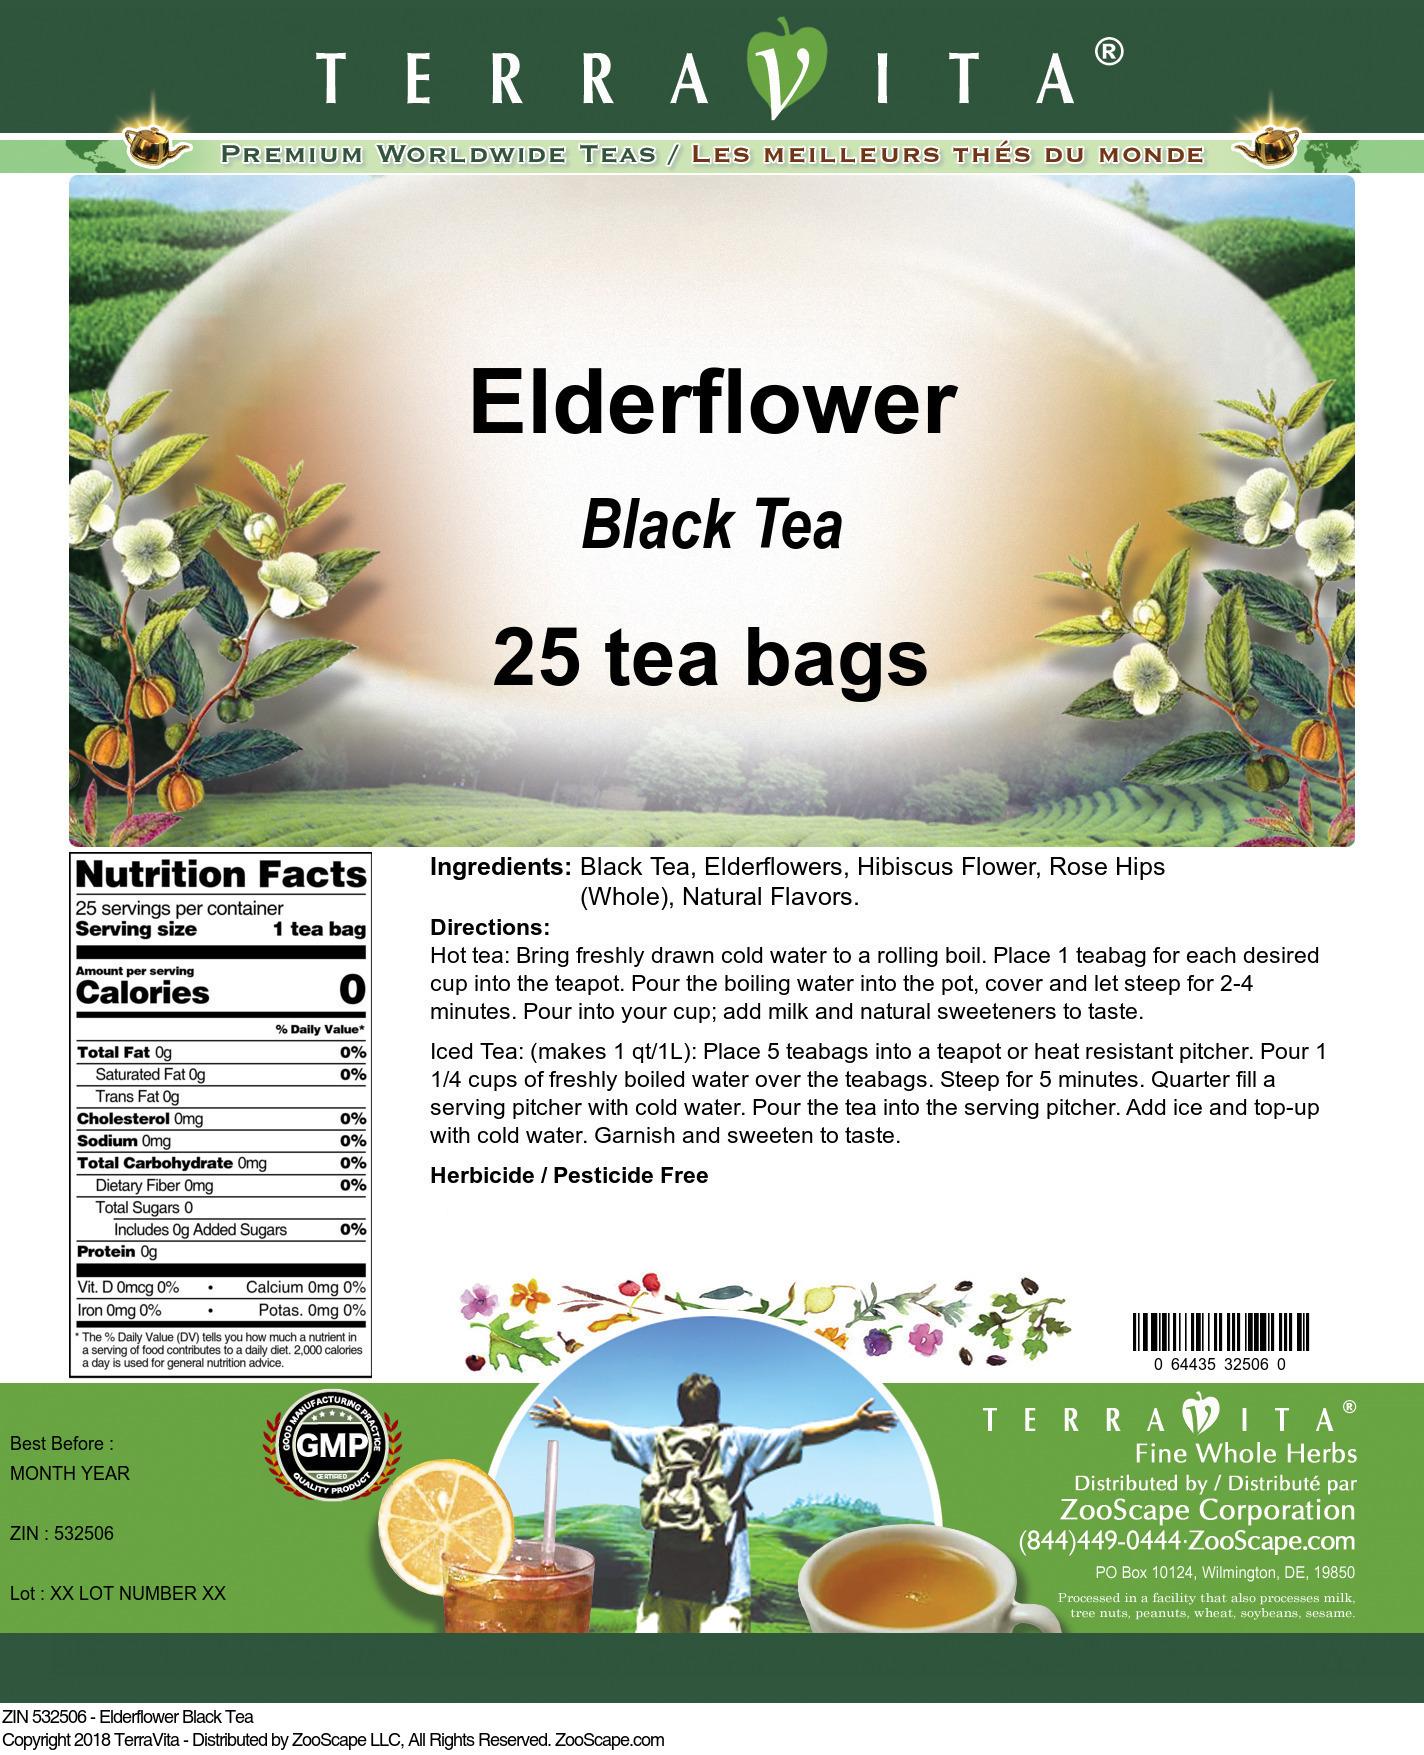 Elderflower Black Tea